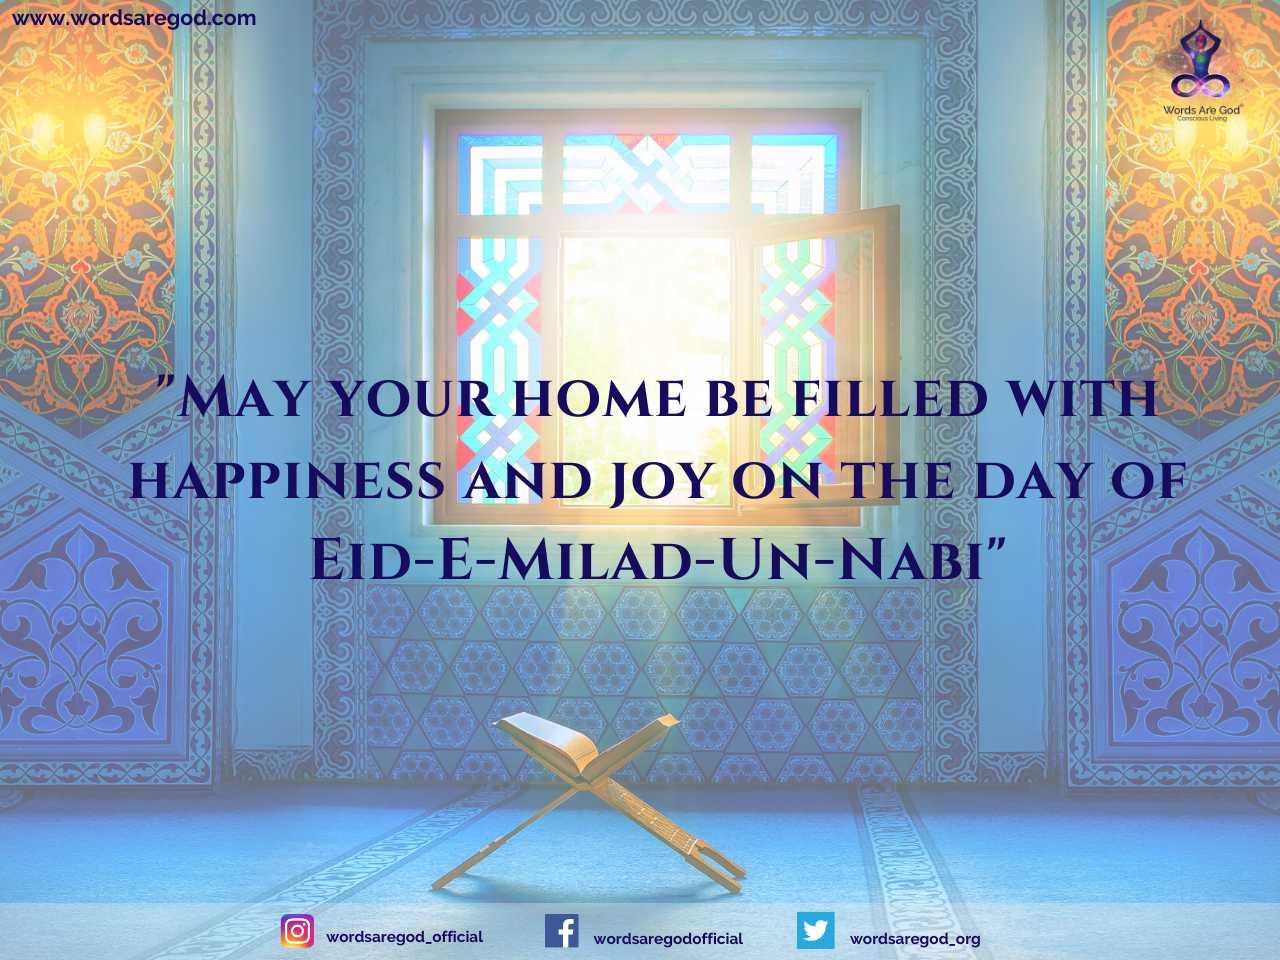 Happy Eid Milad-Un-Nabi